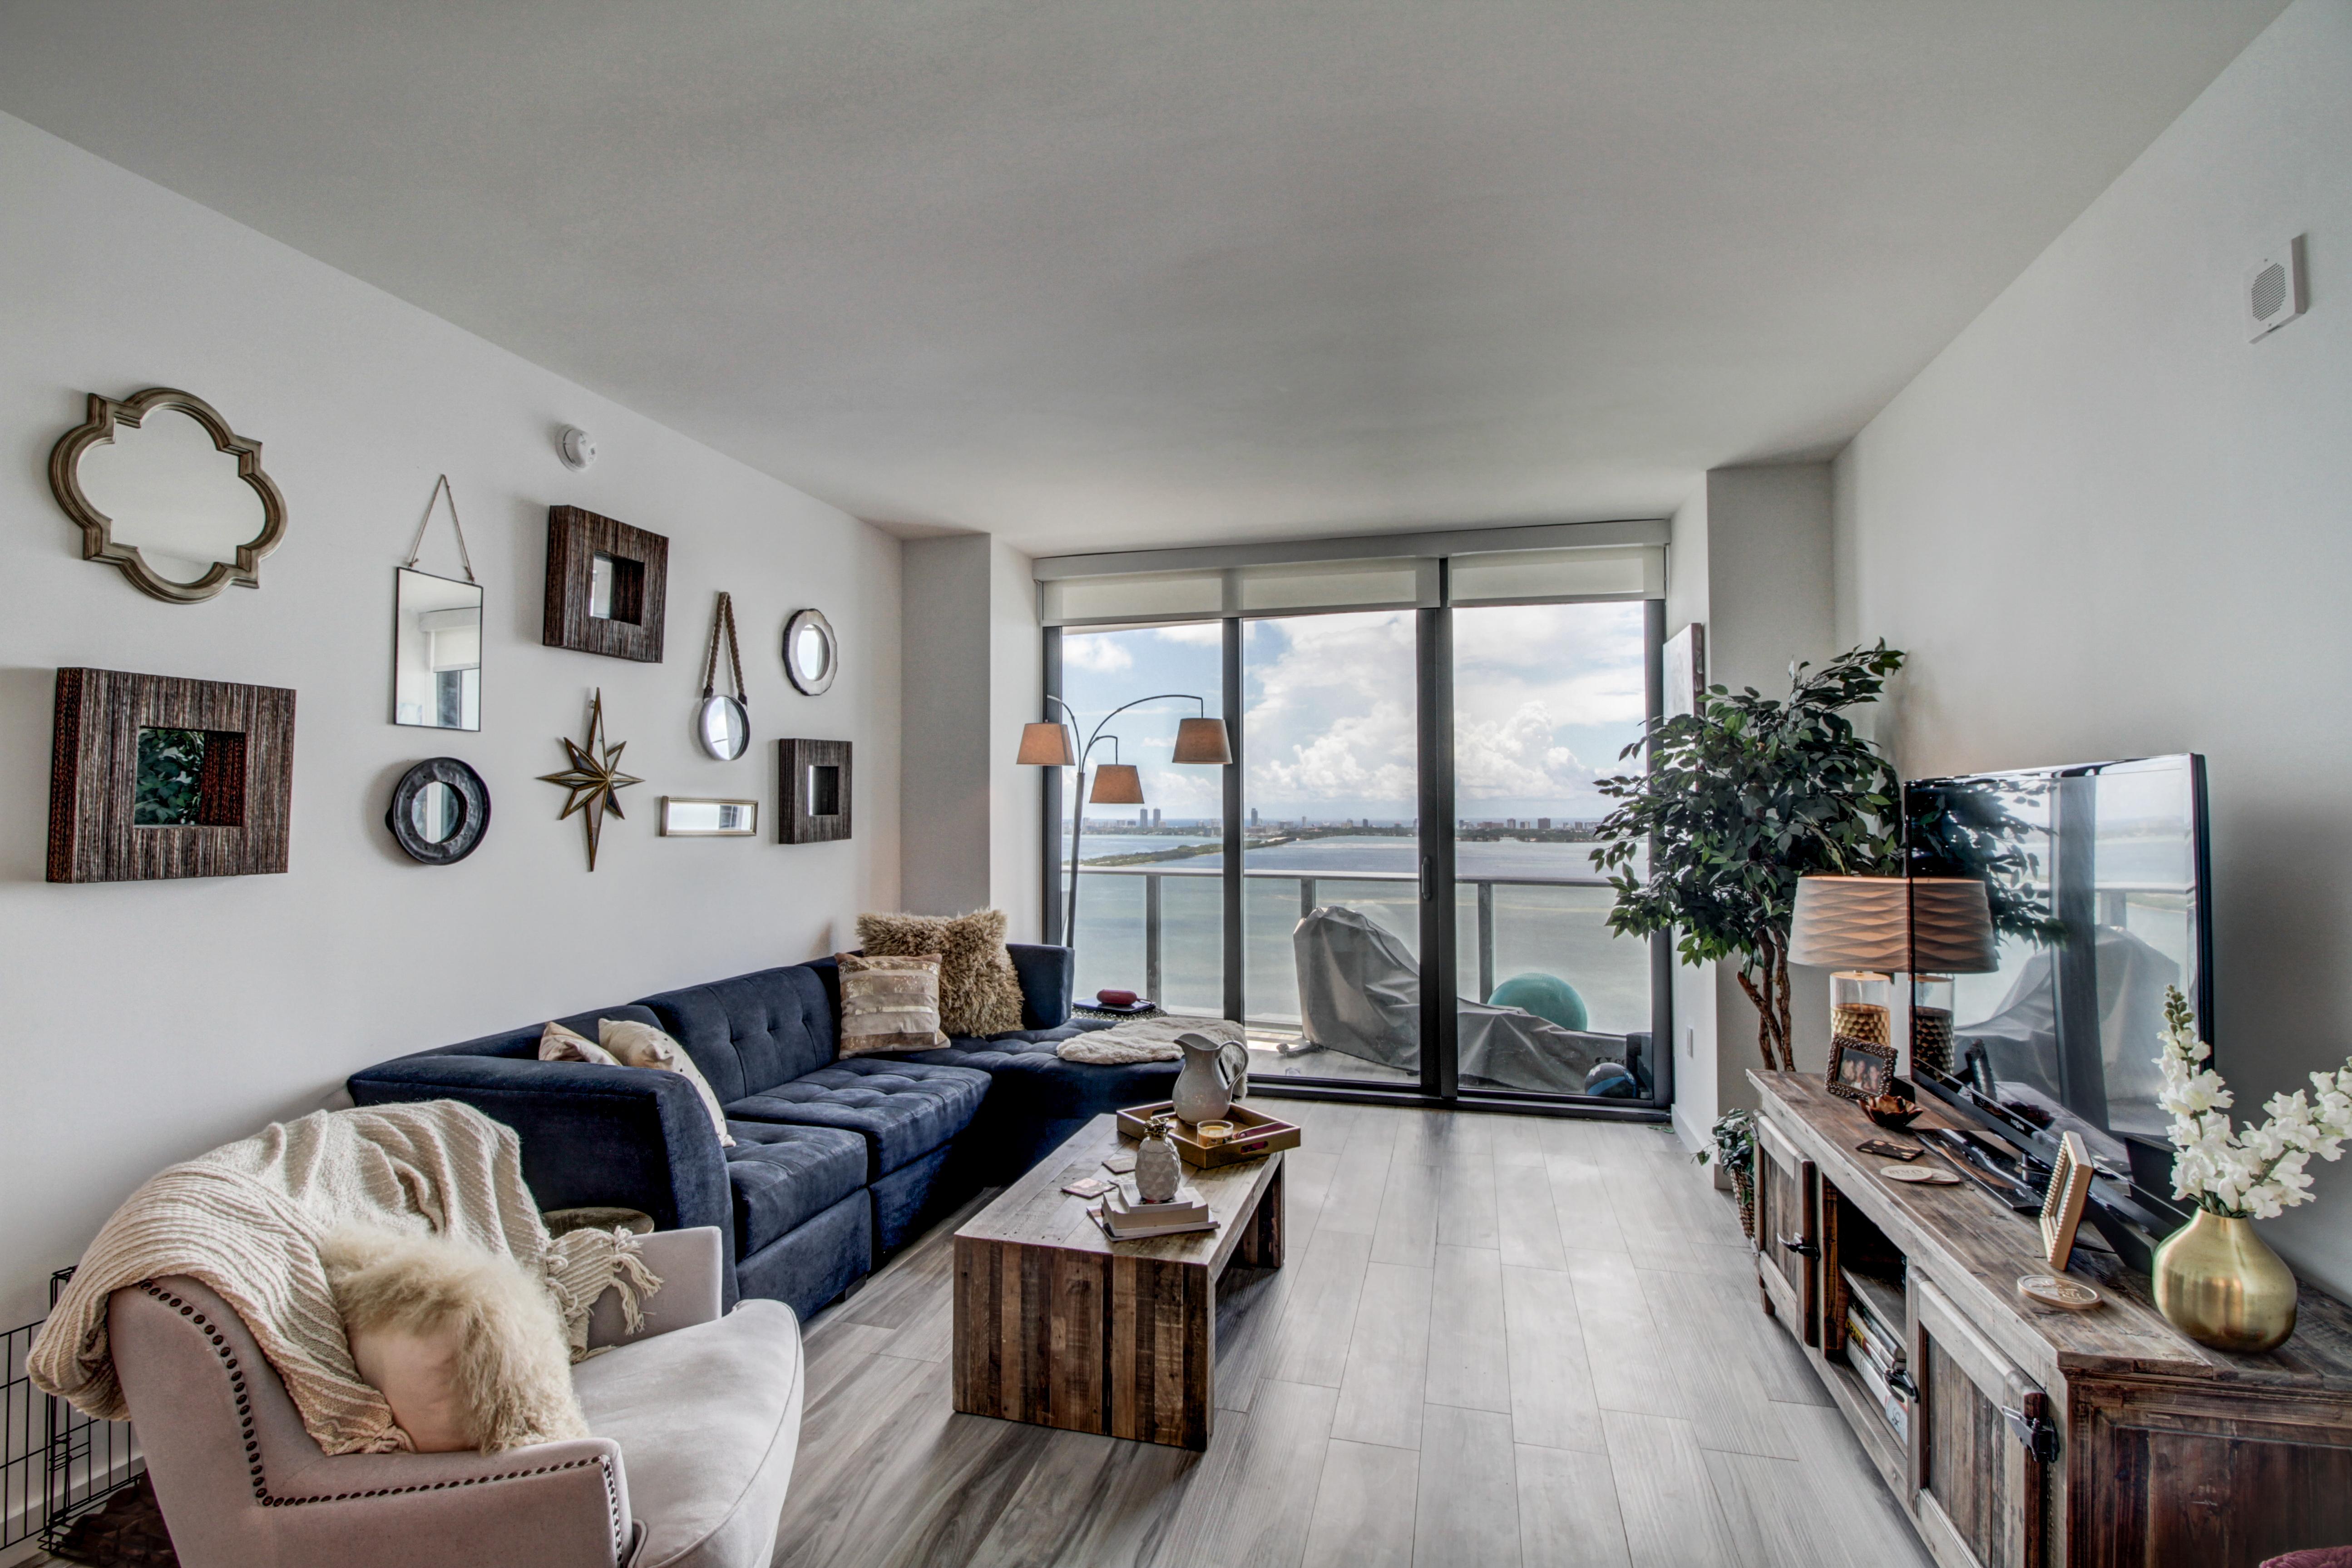 Condominium for Sale at 460 Ne 28th St #3402 460 Ne 28th St 3402 Miami, Florida, 33137 United States